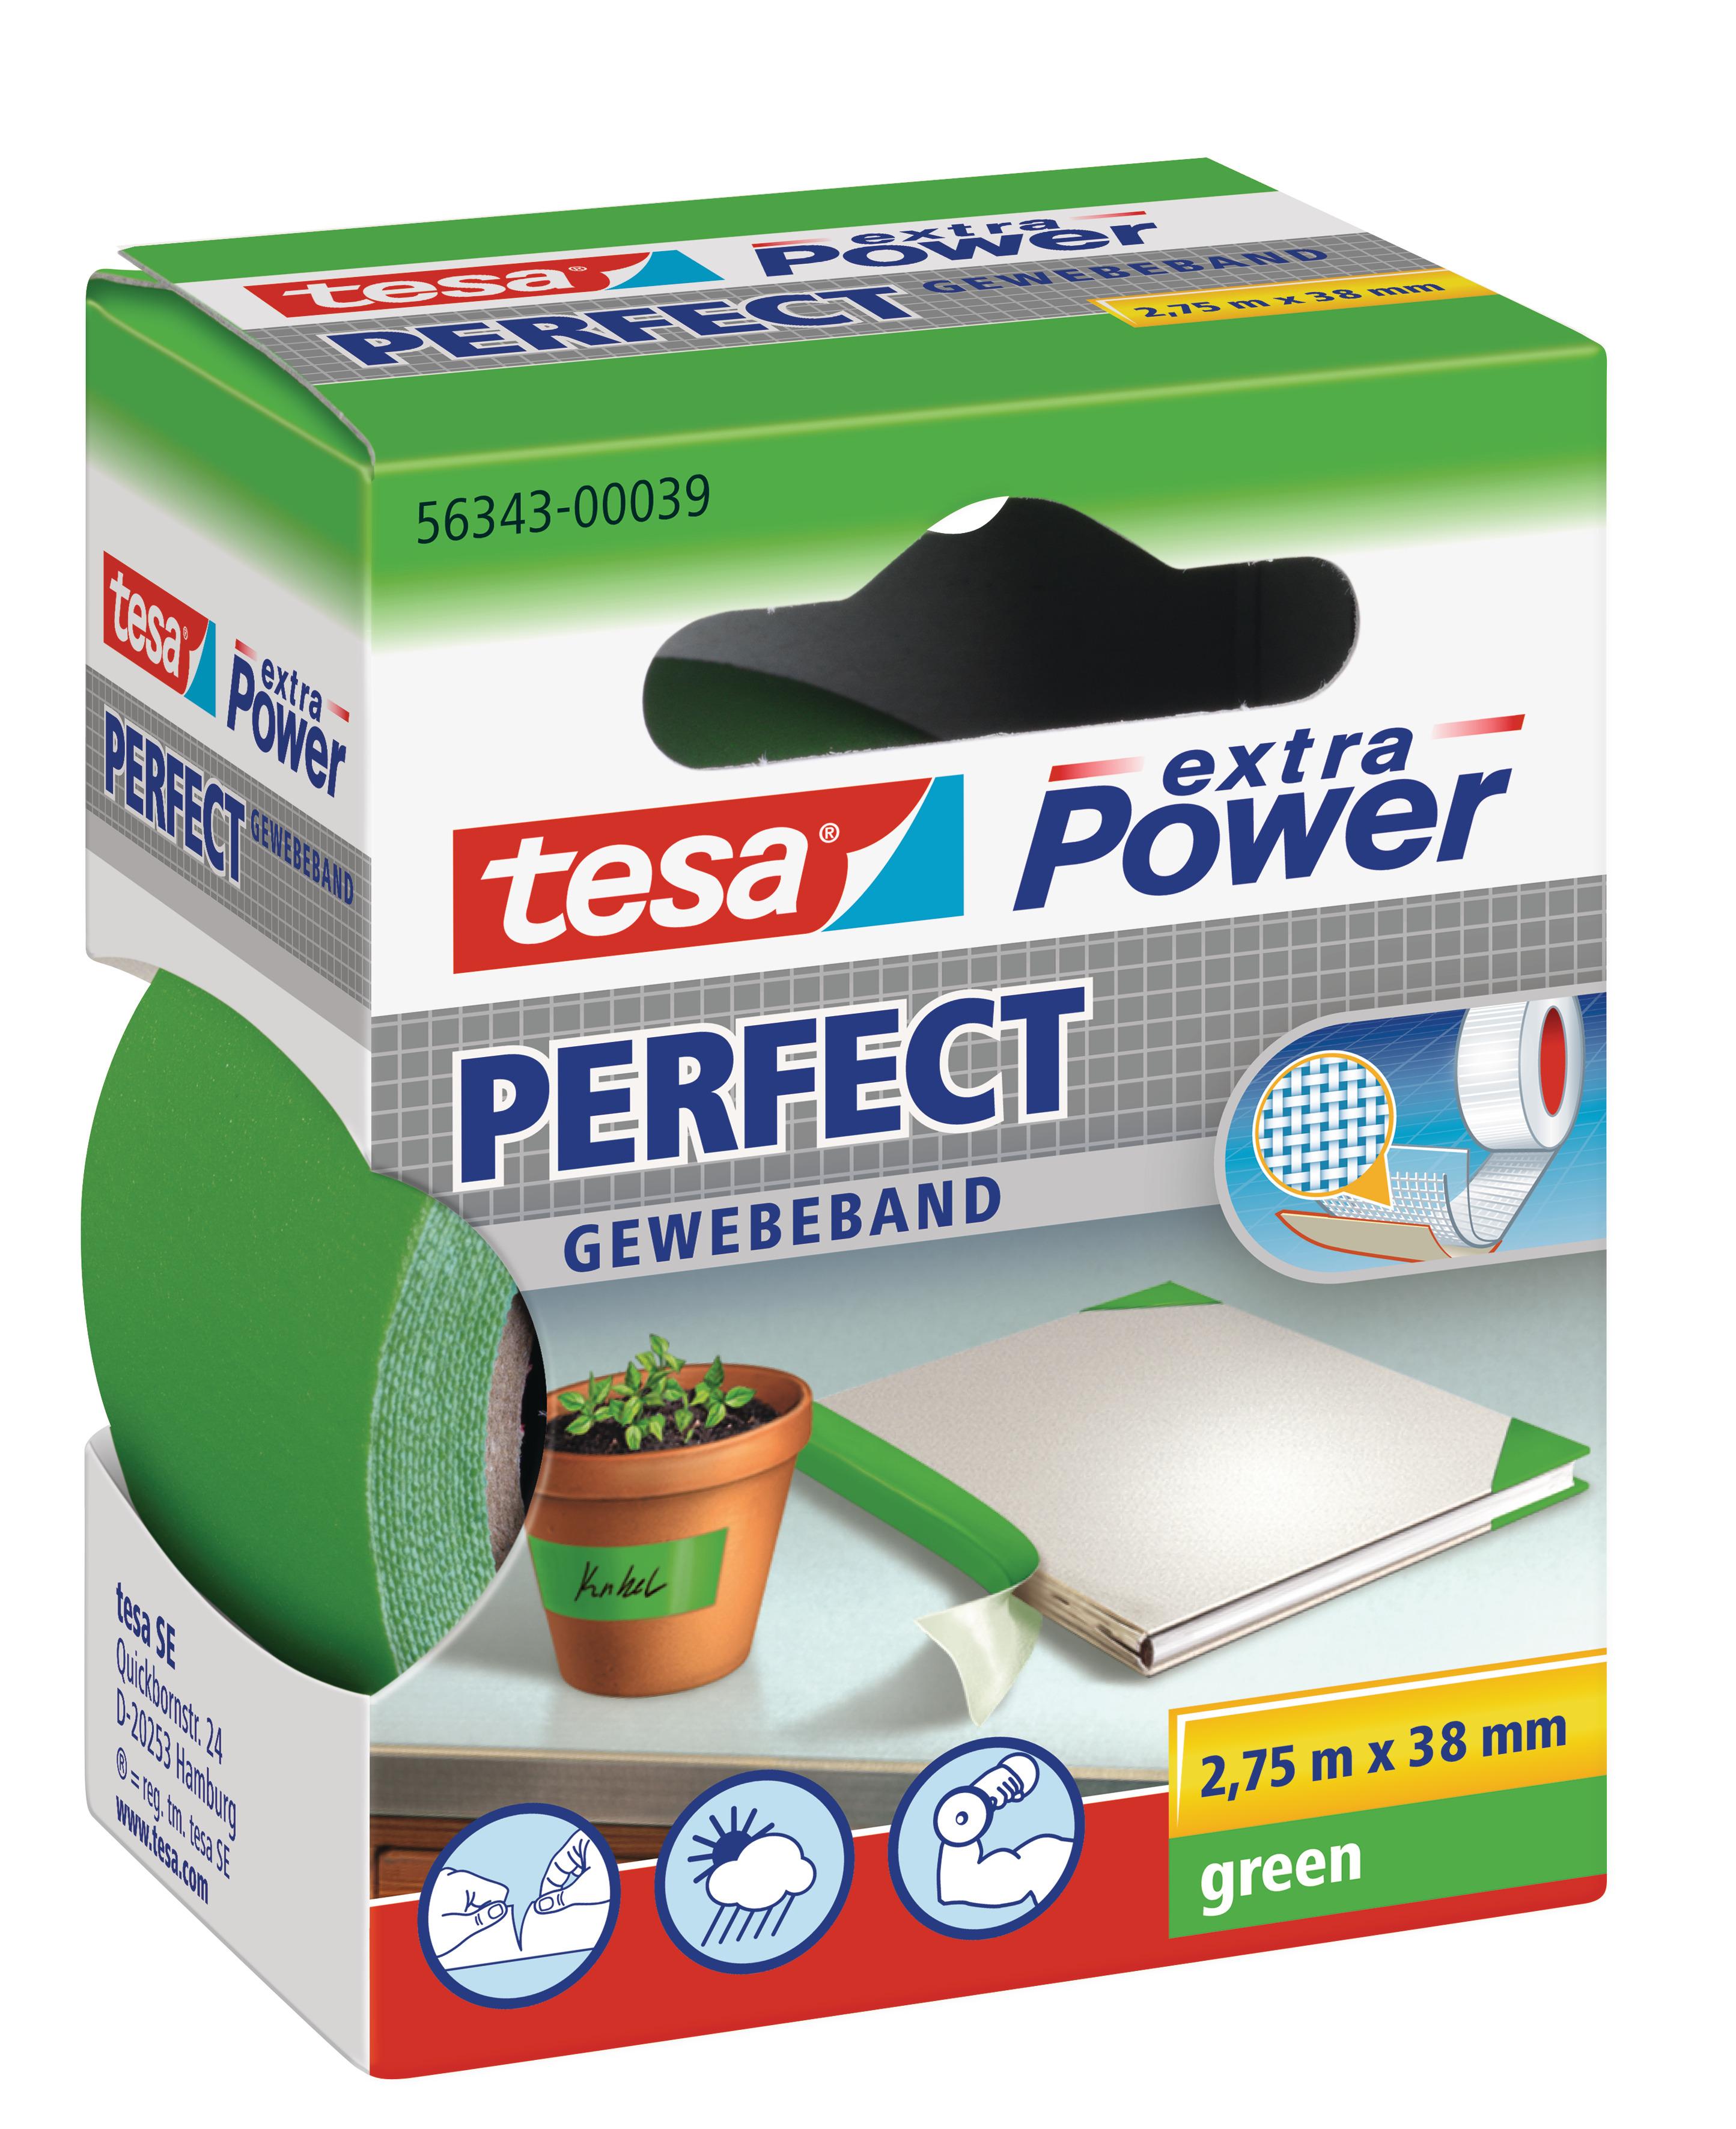 Vorschau: GP: 1,45 EUR/m tesa extra Power Perfect Gewebeband grün 2,75m x 38mm